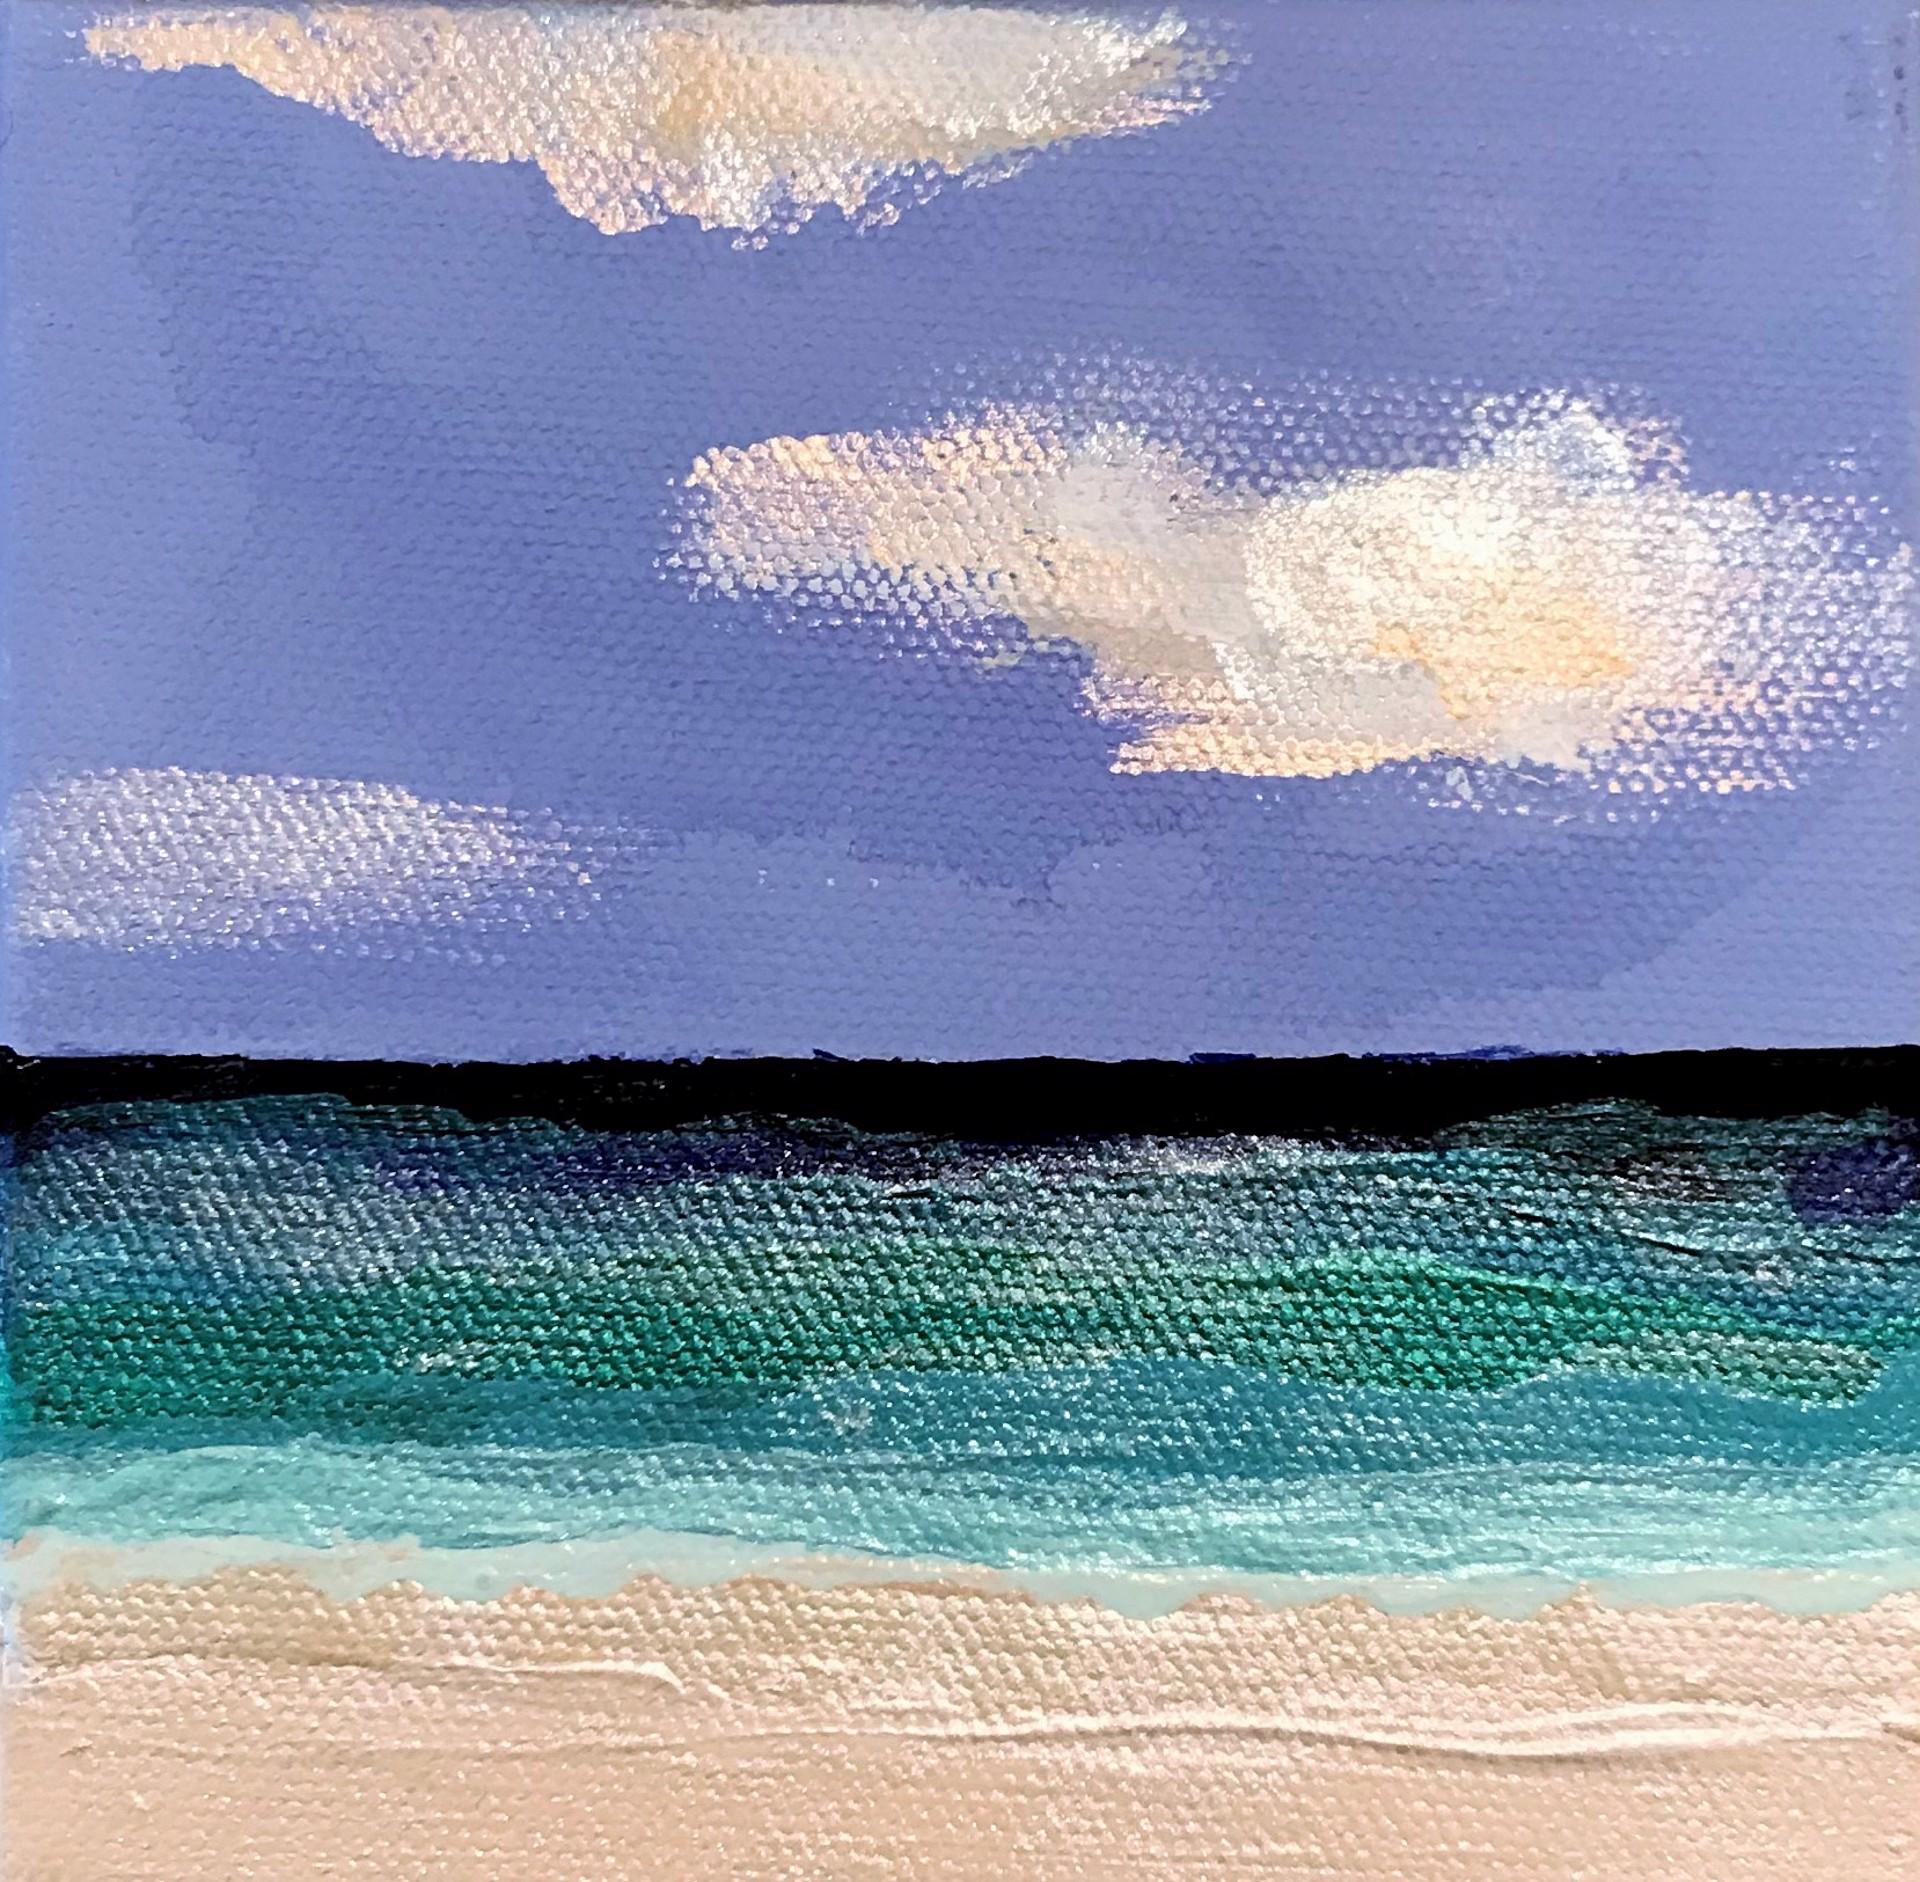 Beachfront No. 5 by Leslie Poteet Busker